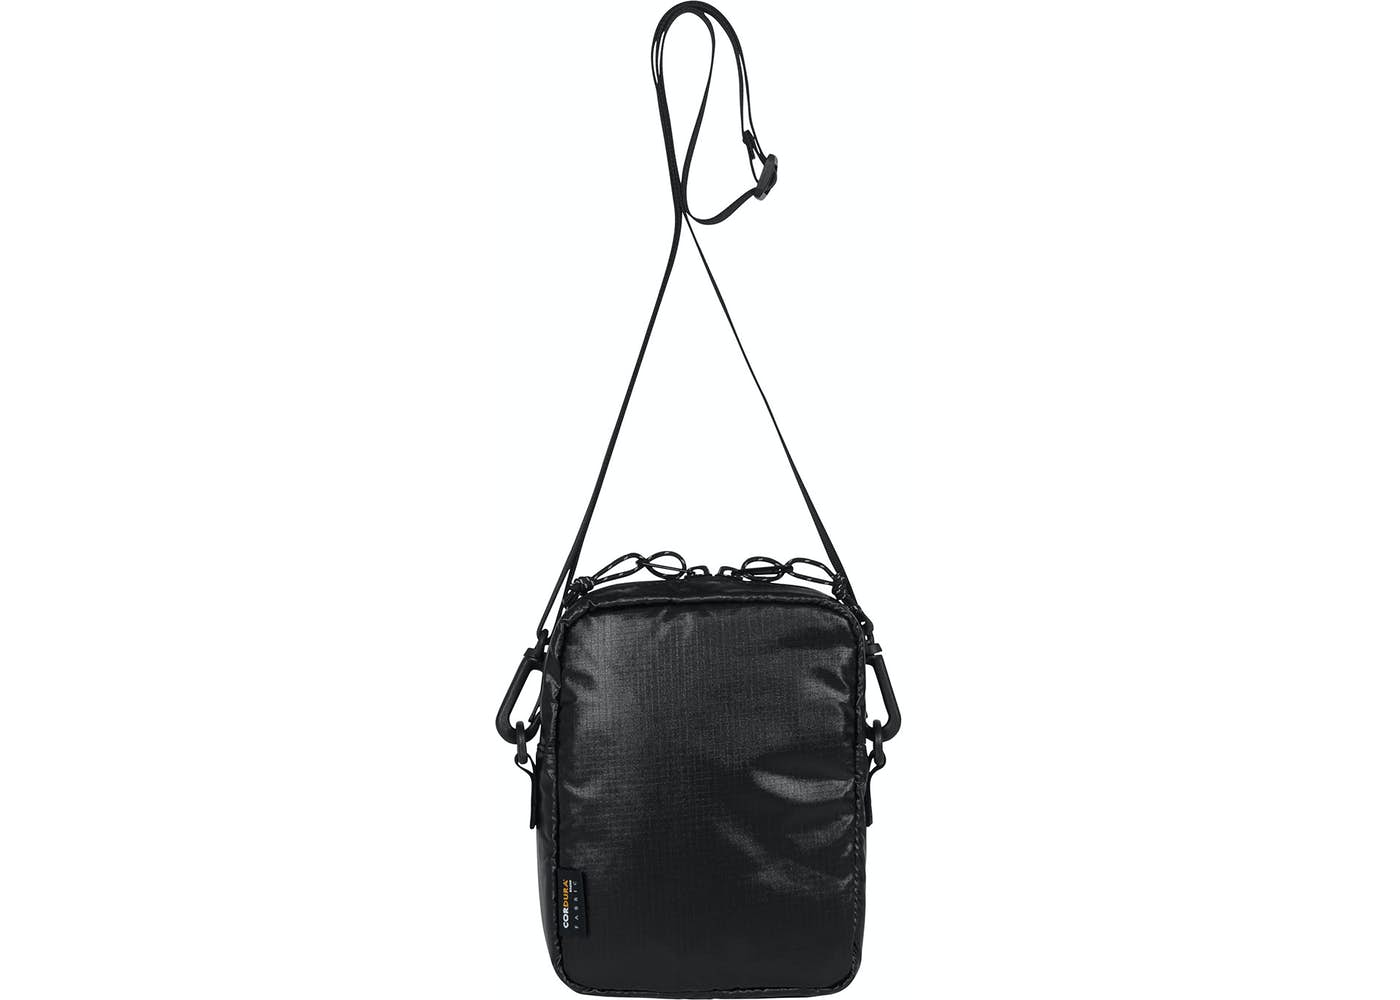 cb98484a Dhgate Supreme Shoulder Bag | City of Kenmore, Washington